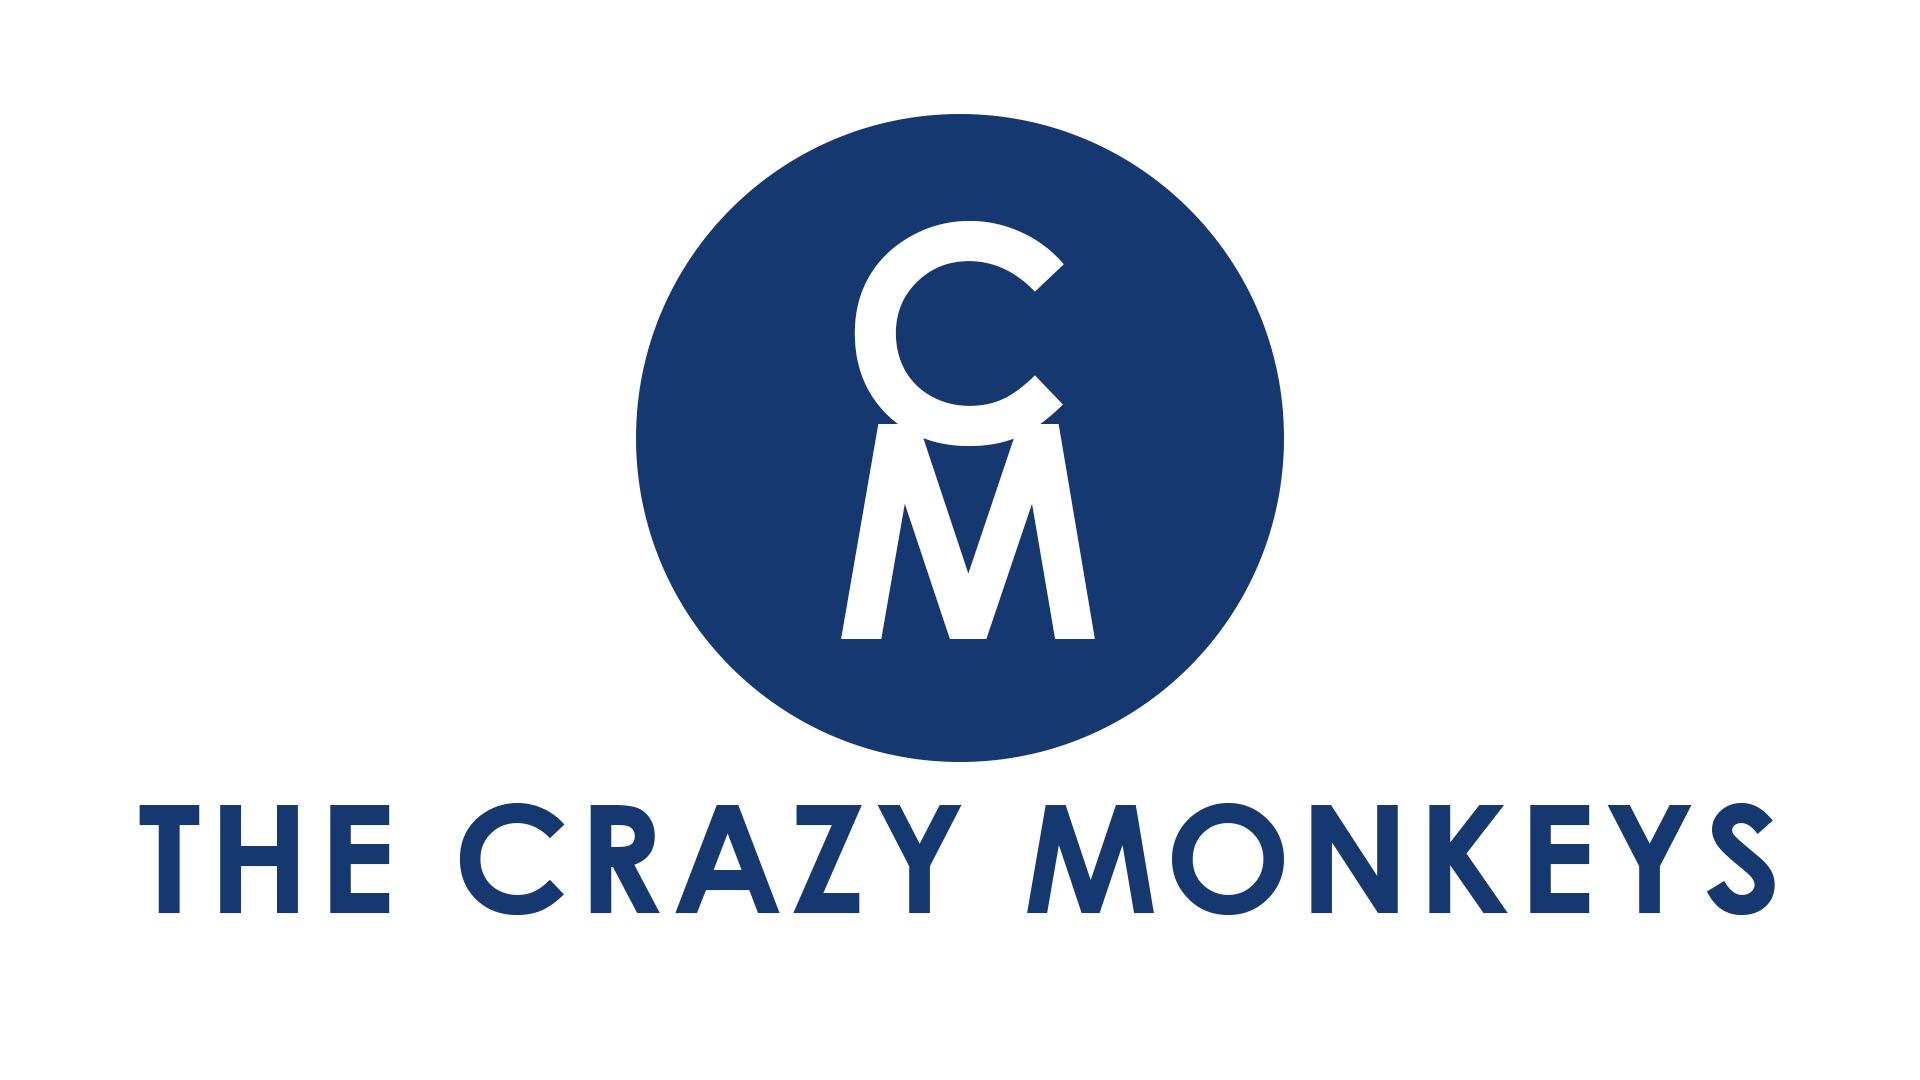 The Crazy Monkeys